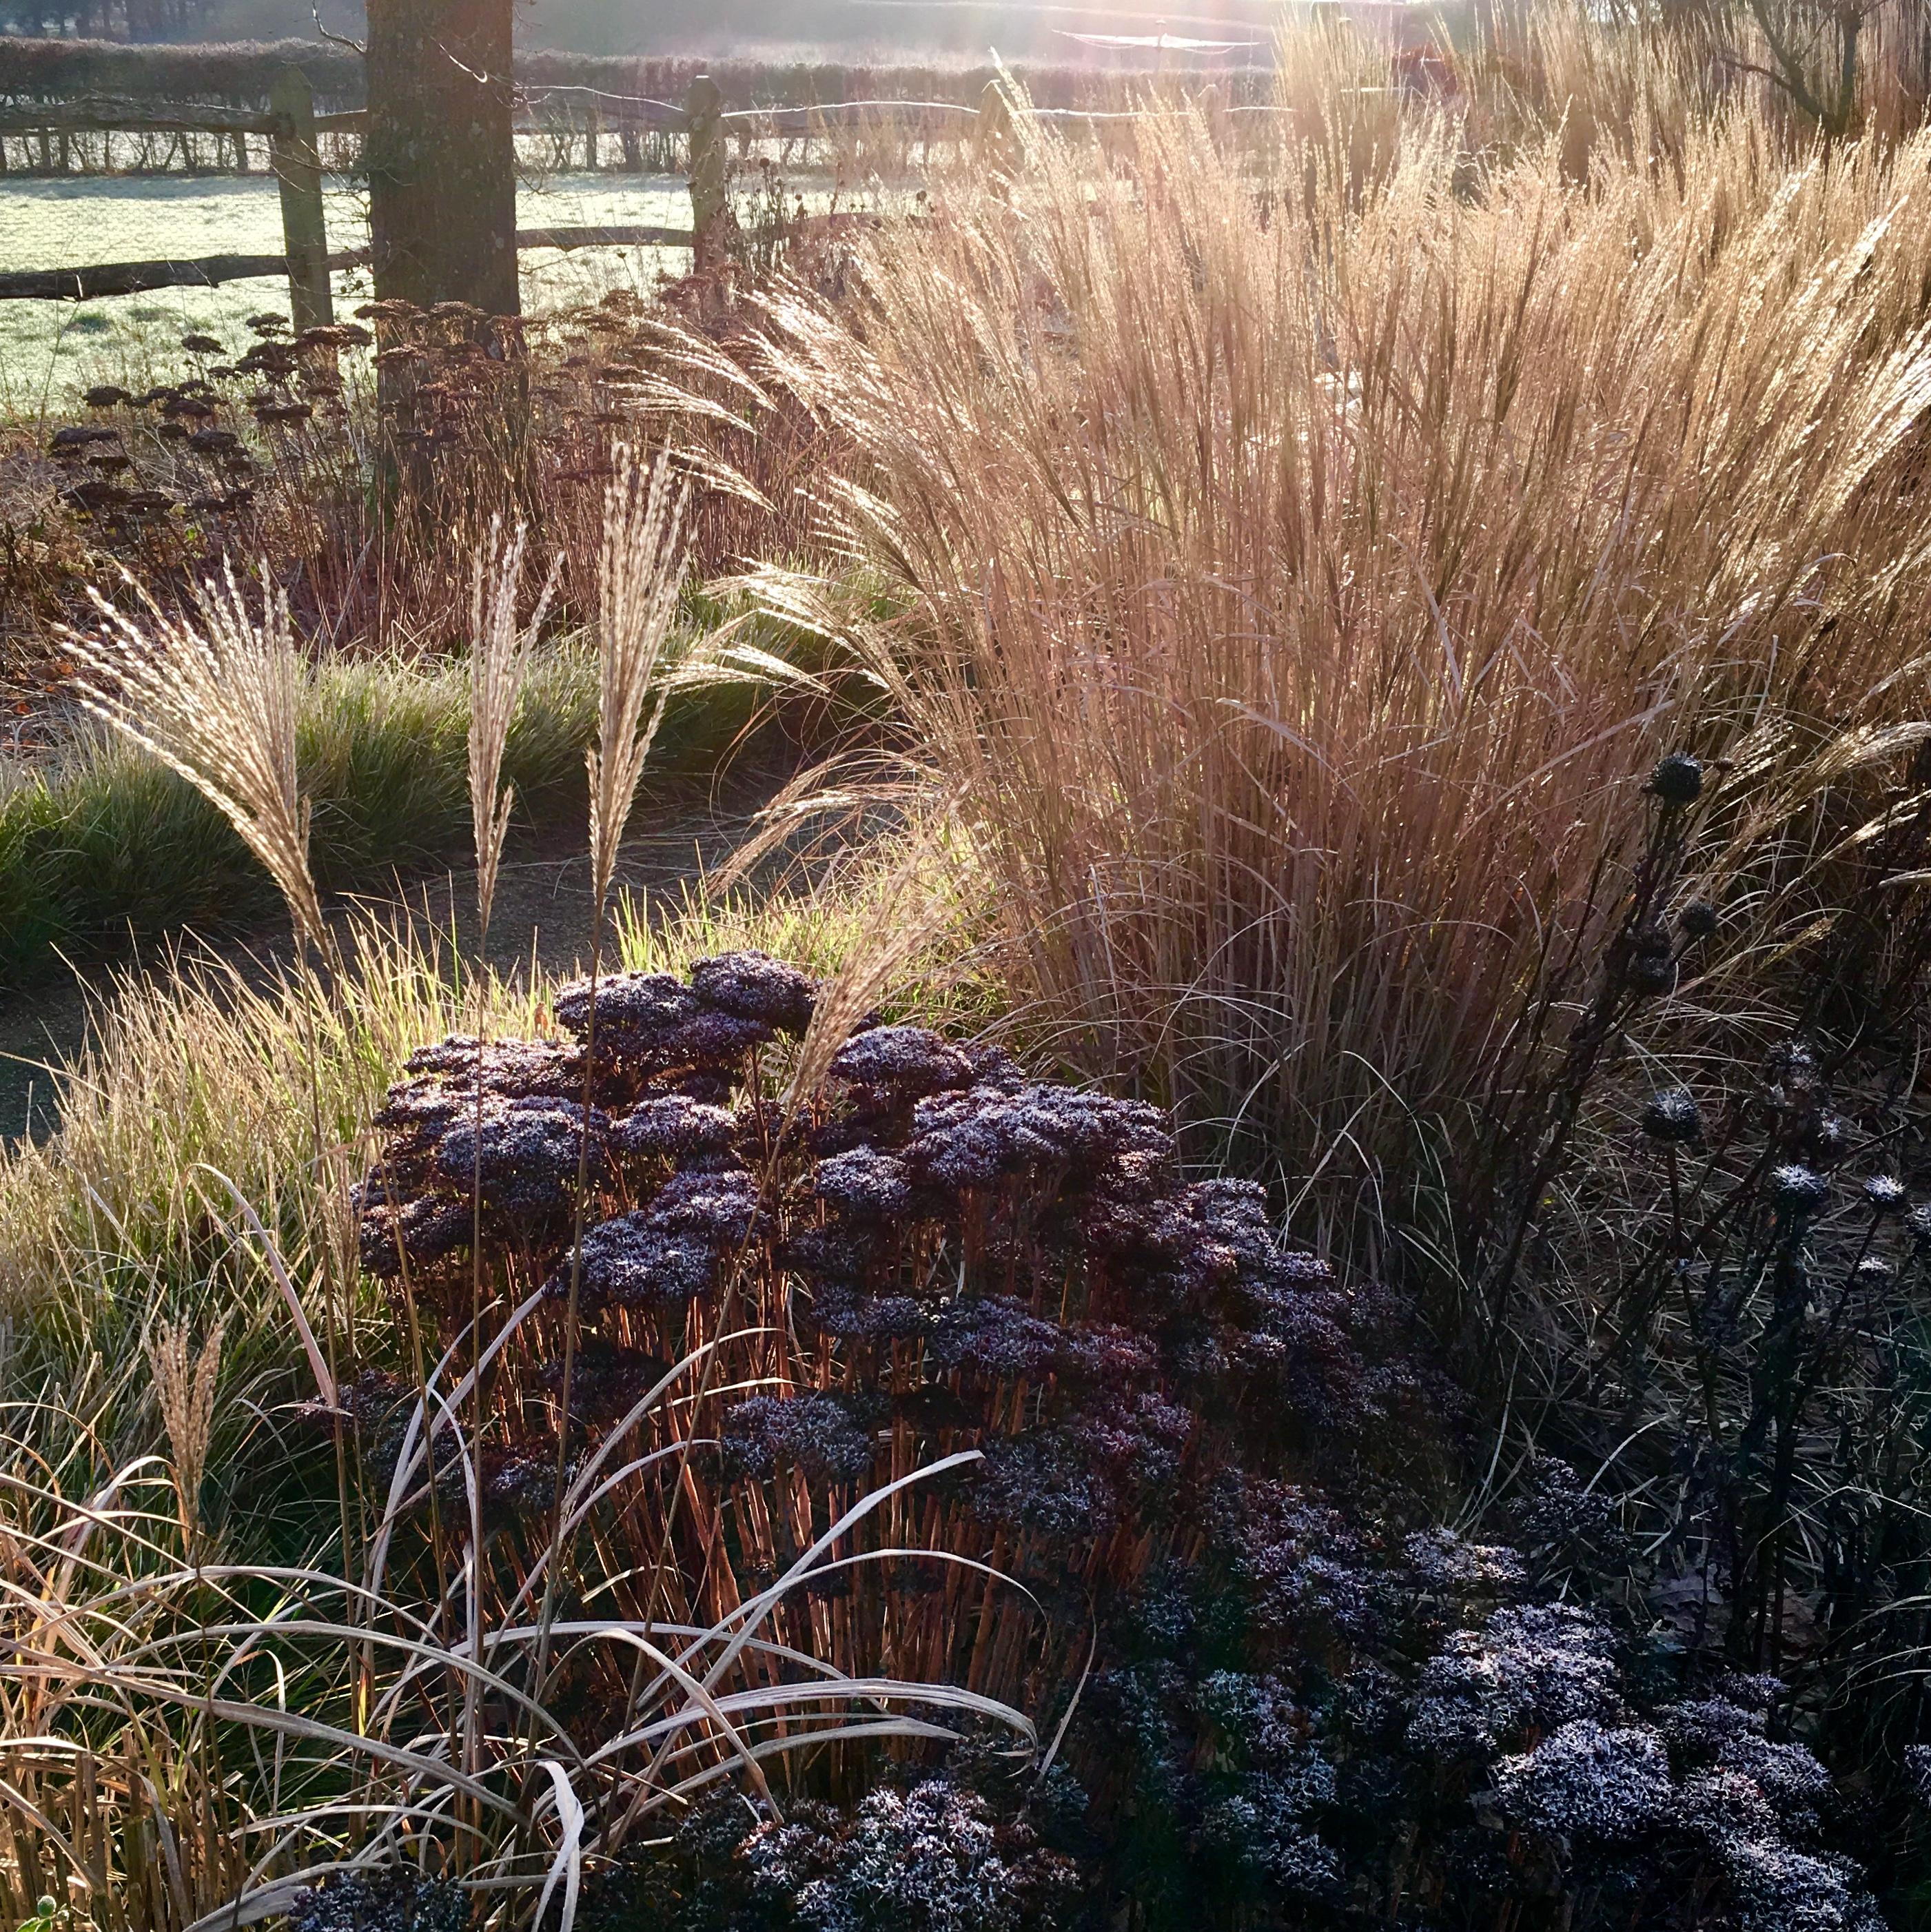 Acres Wild Artfully Accessible Sedum and Grasses